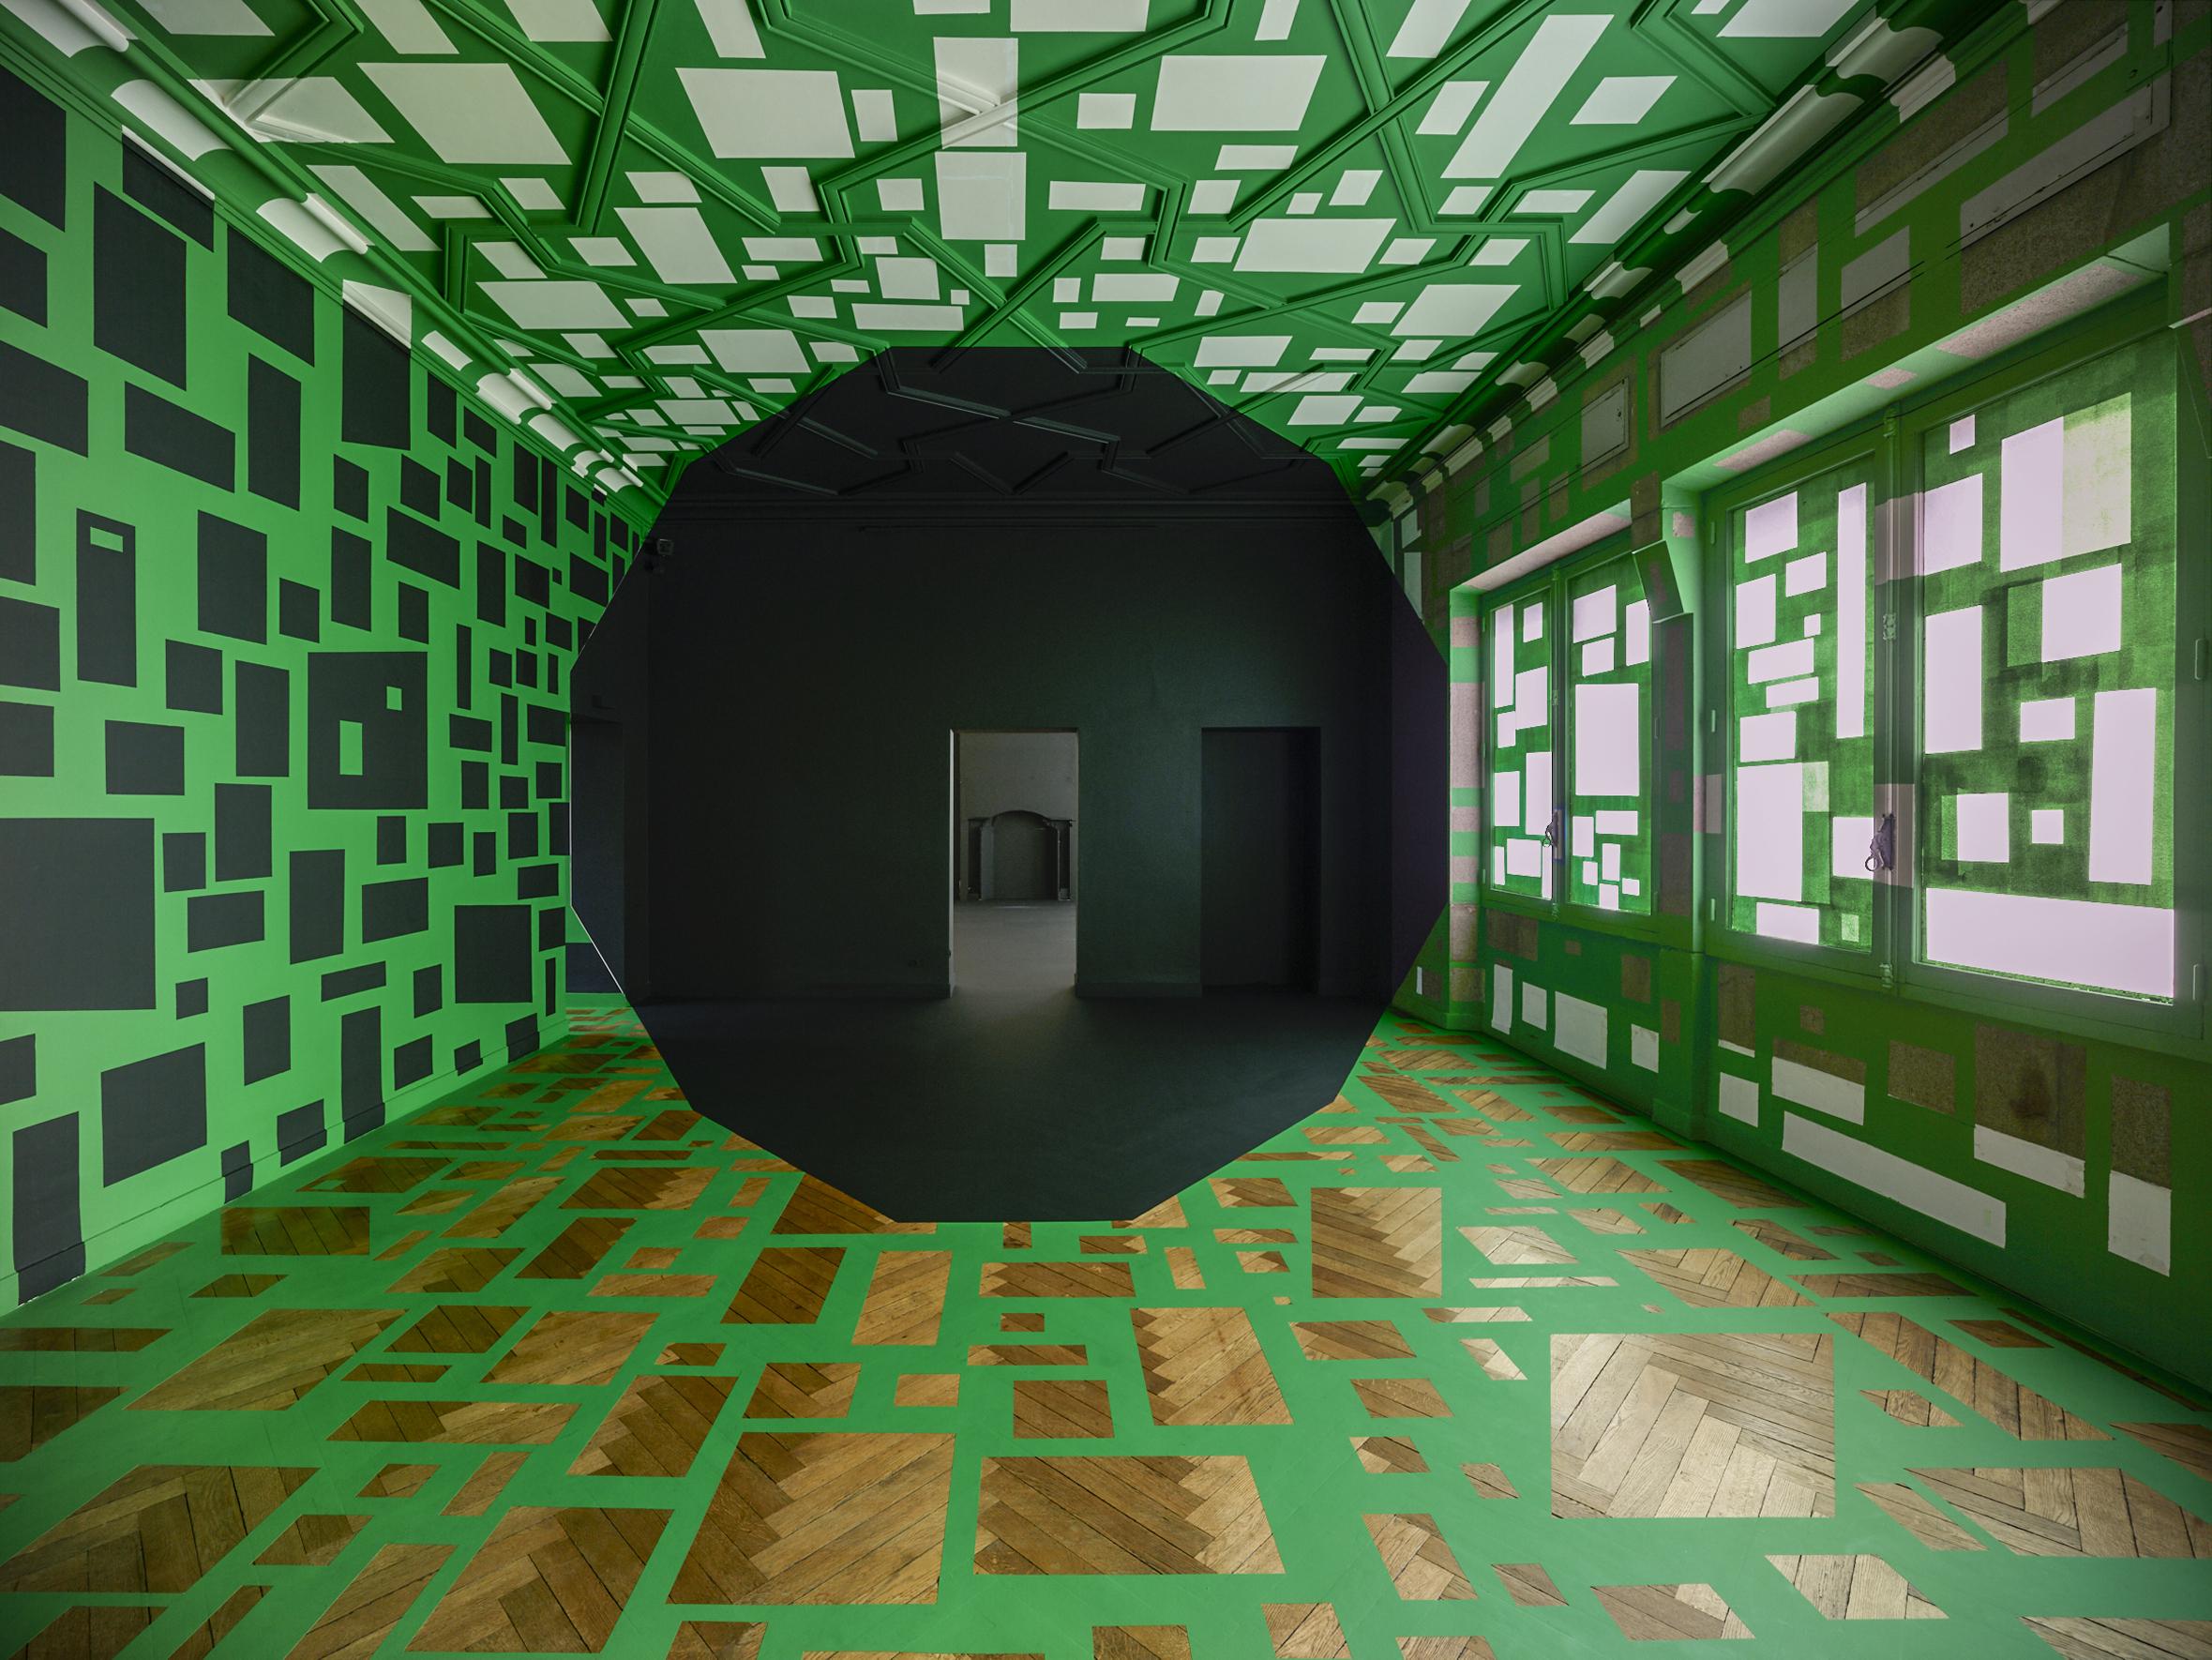 Georges Rousse,  Nantes 2018 , 2018, stampa fotografica ai pigmenti su carta Hahnemuhle, 110 x 140 cm, courtesy Photo&Contemporary, Torino